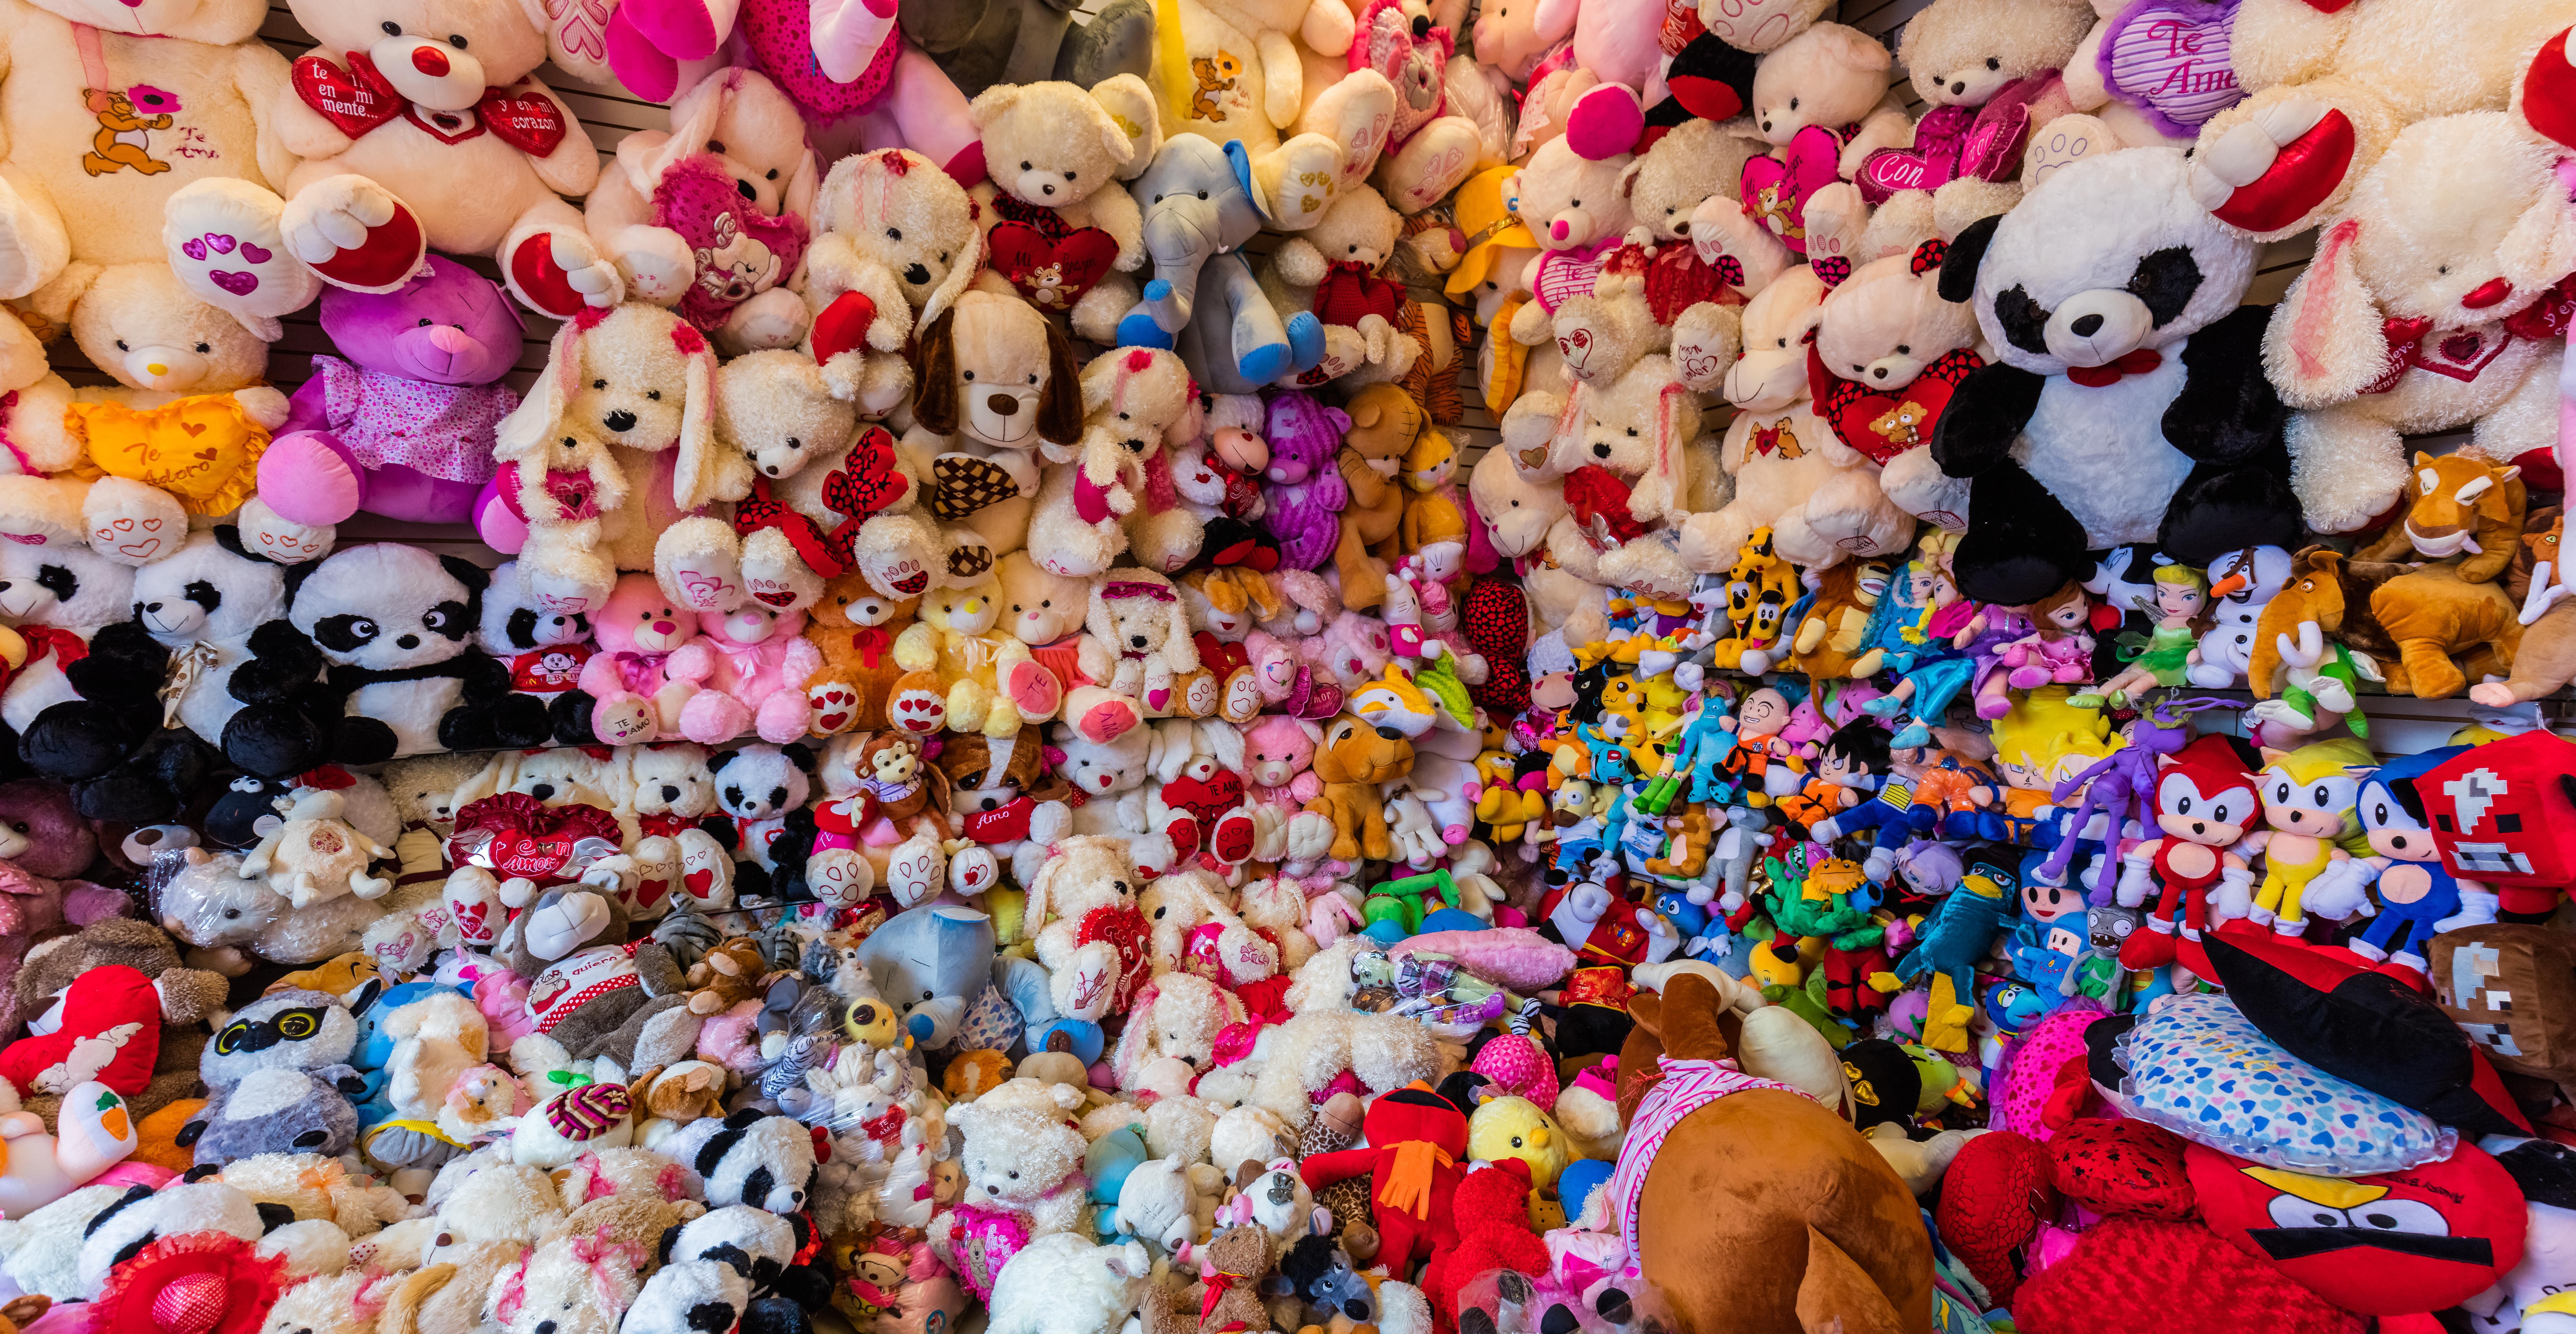 Dog Toy Wholesale Suppliers Uk